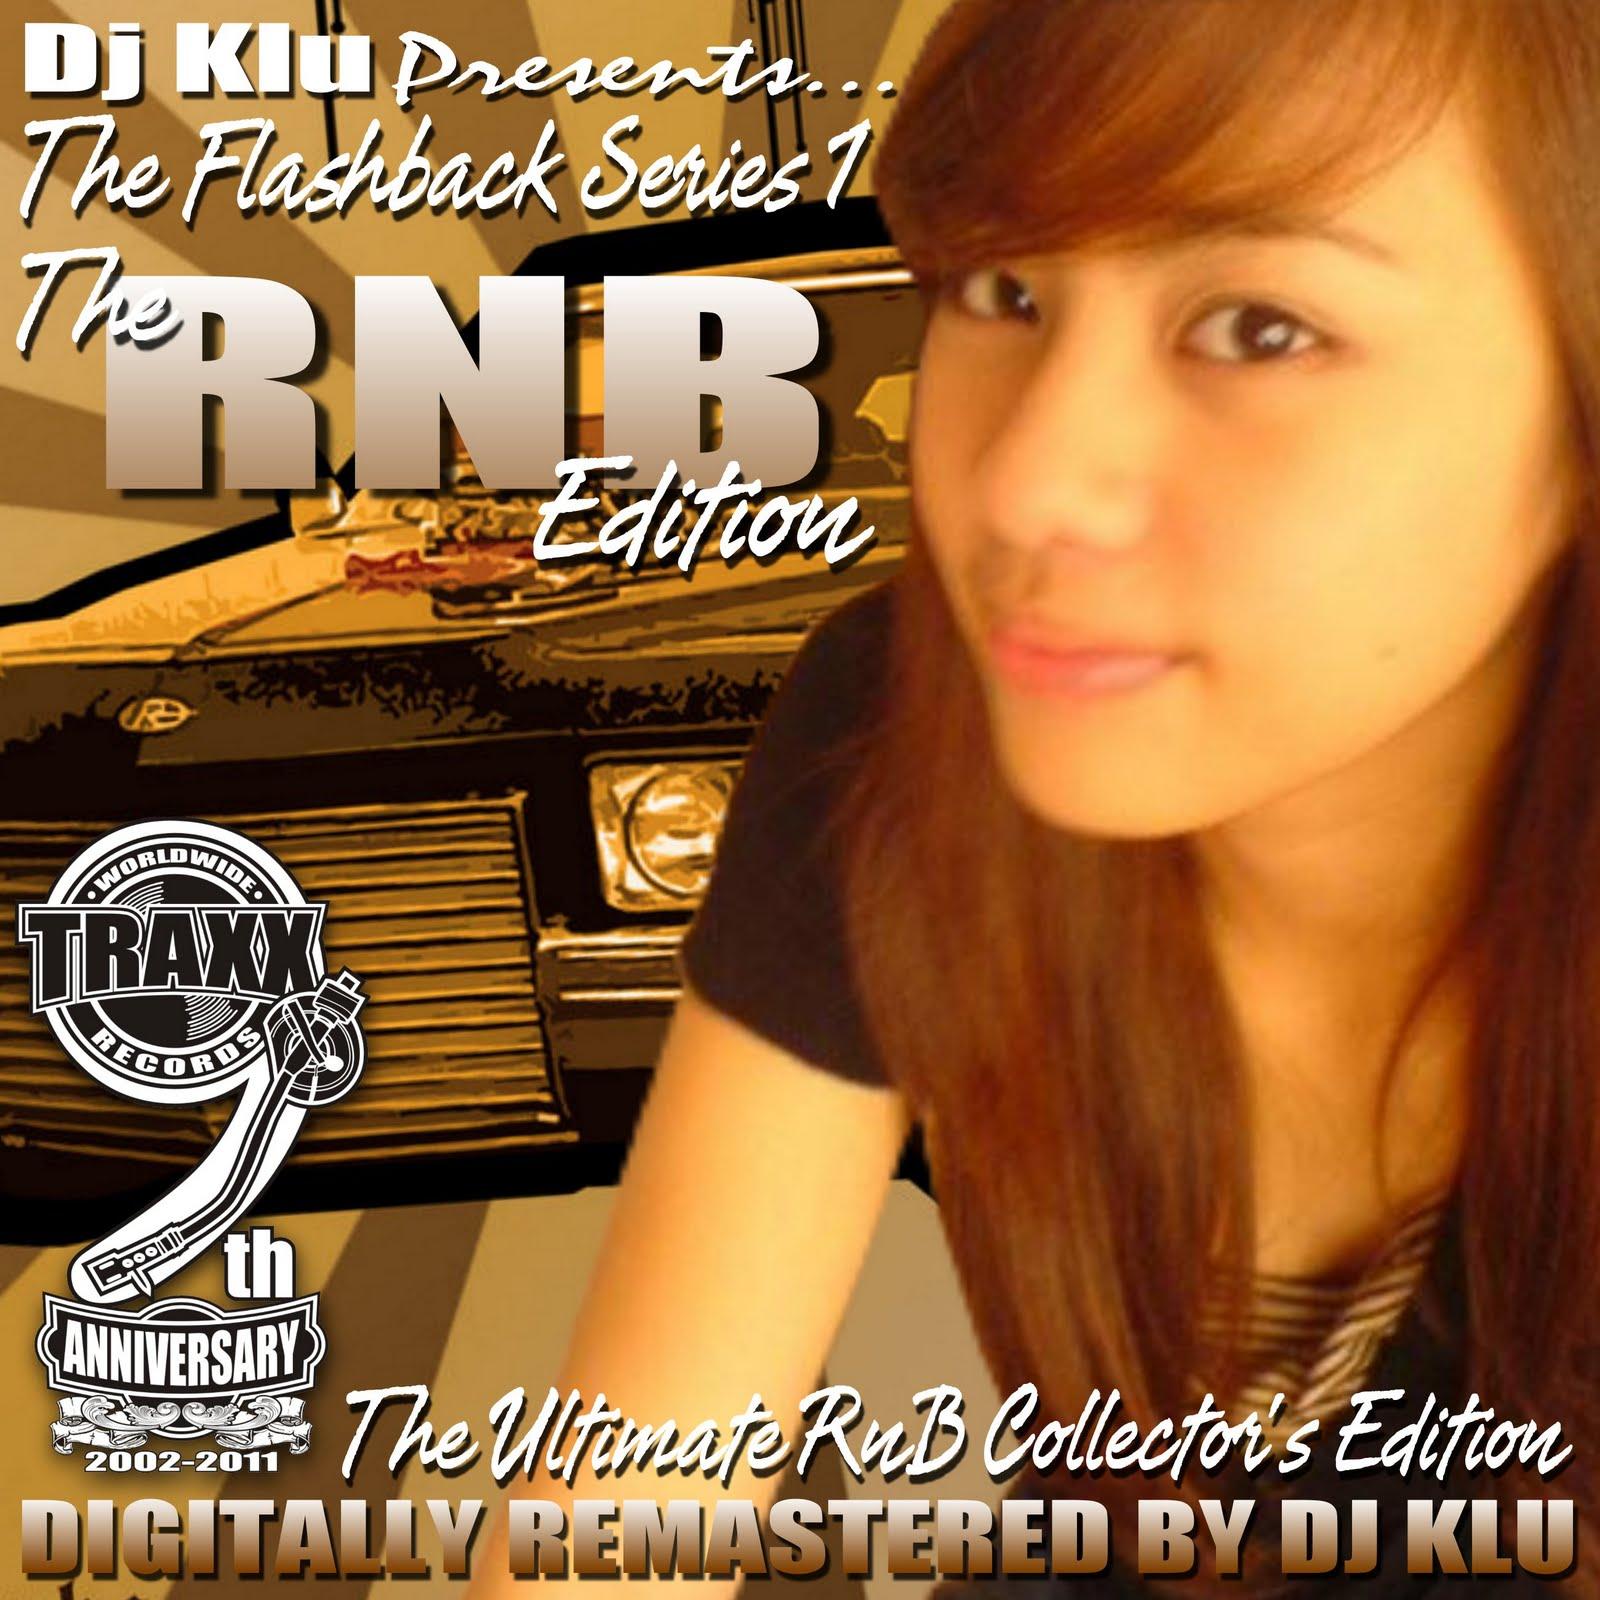 r kelly hey mr dj mp3 free download